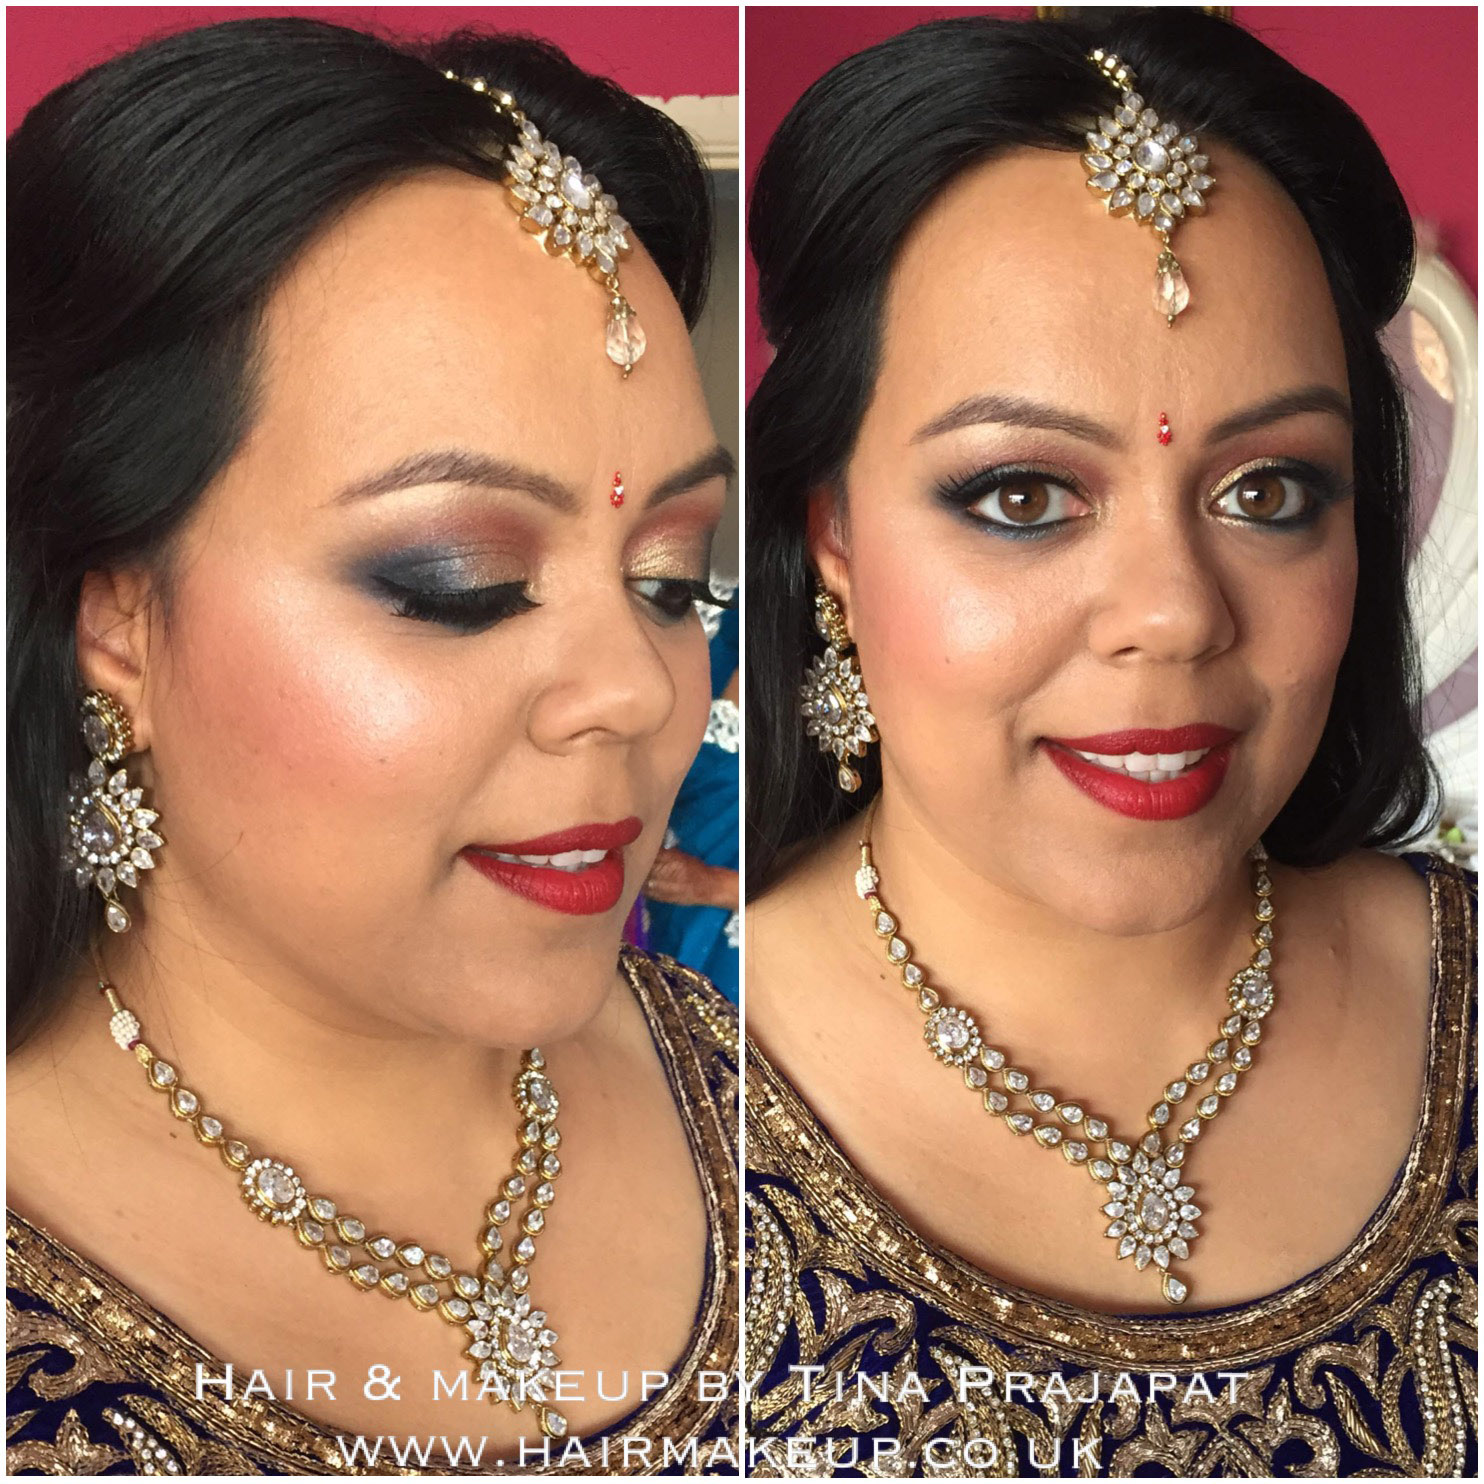 Makeup For Mehndi Night : Real brides and makeovers by tina prajapat